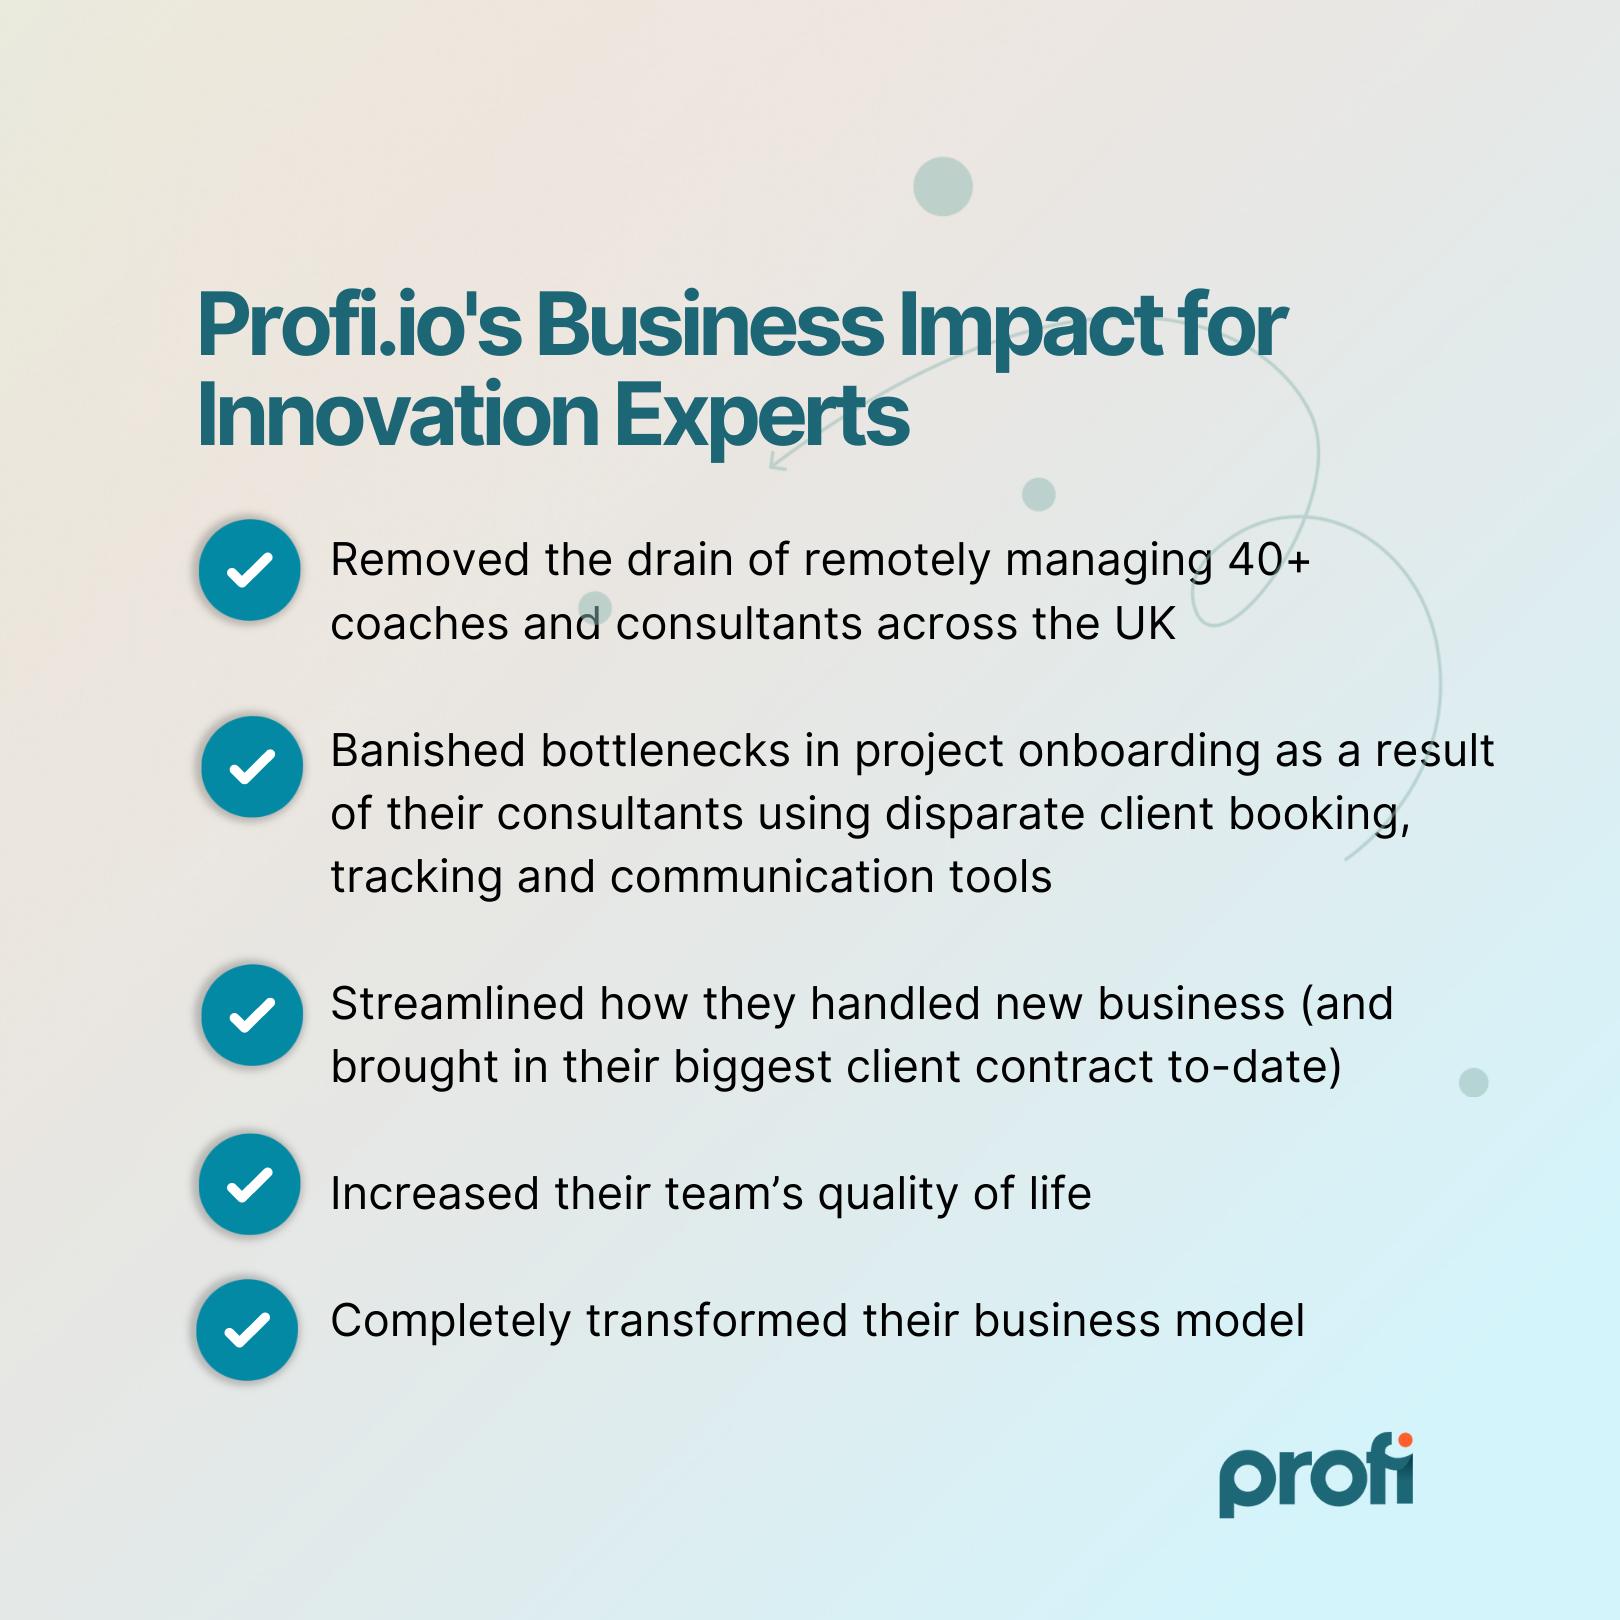 Profi.io business impact for Innovation Experts' on-demand community marketplace